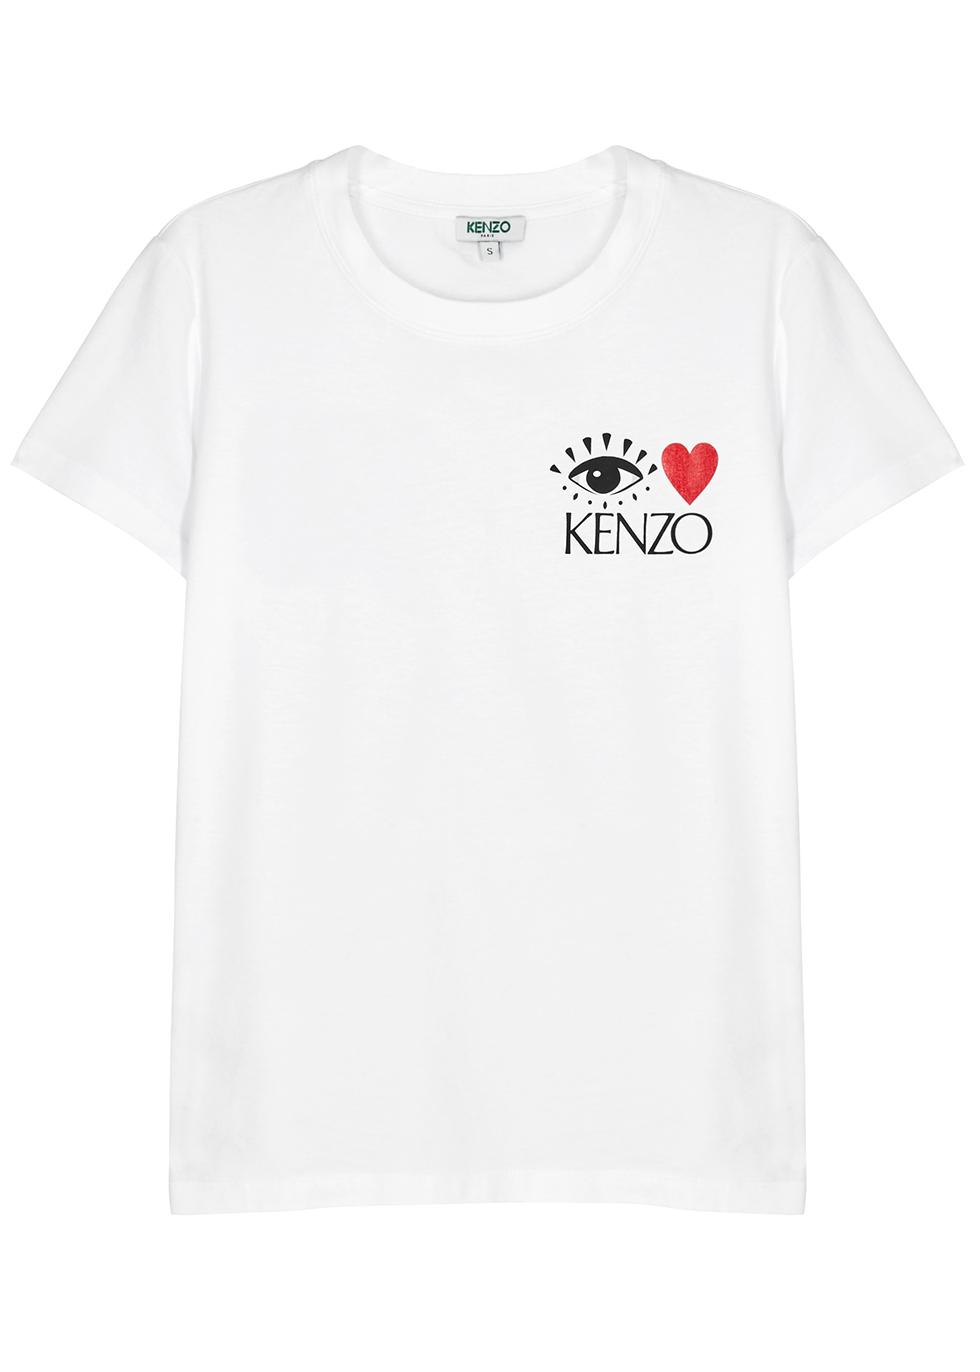 114b3d53b Kenzo - Harvey Nichols